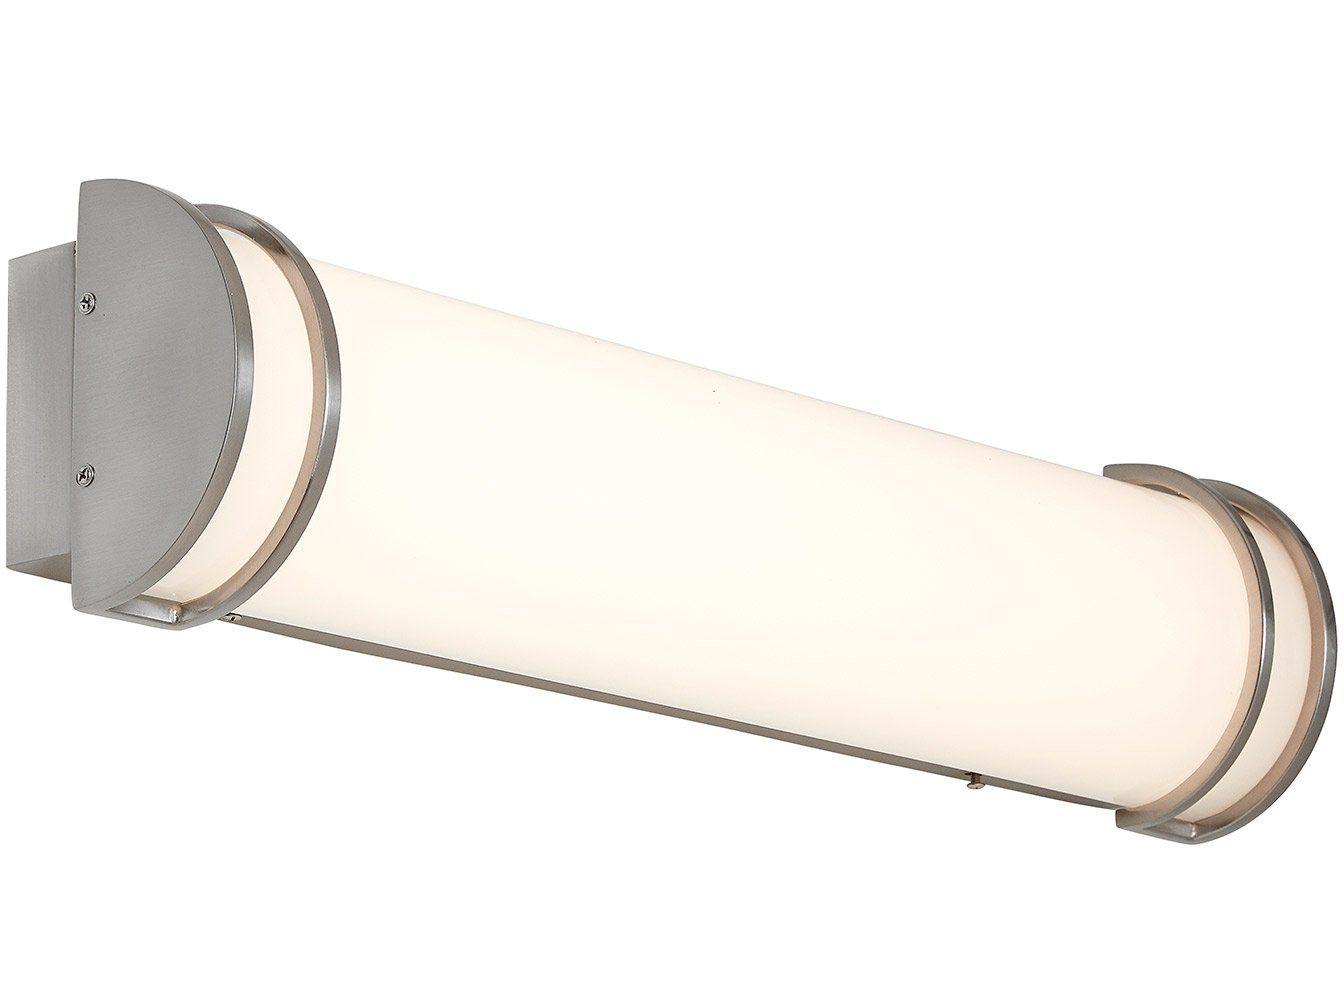 New flush mount brushed nickel modern frosted bathroom vanity light